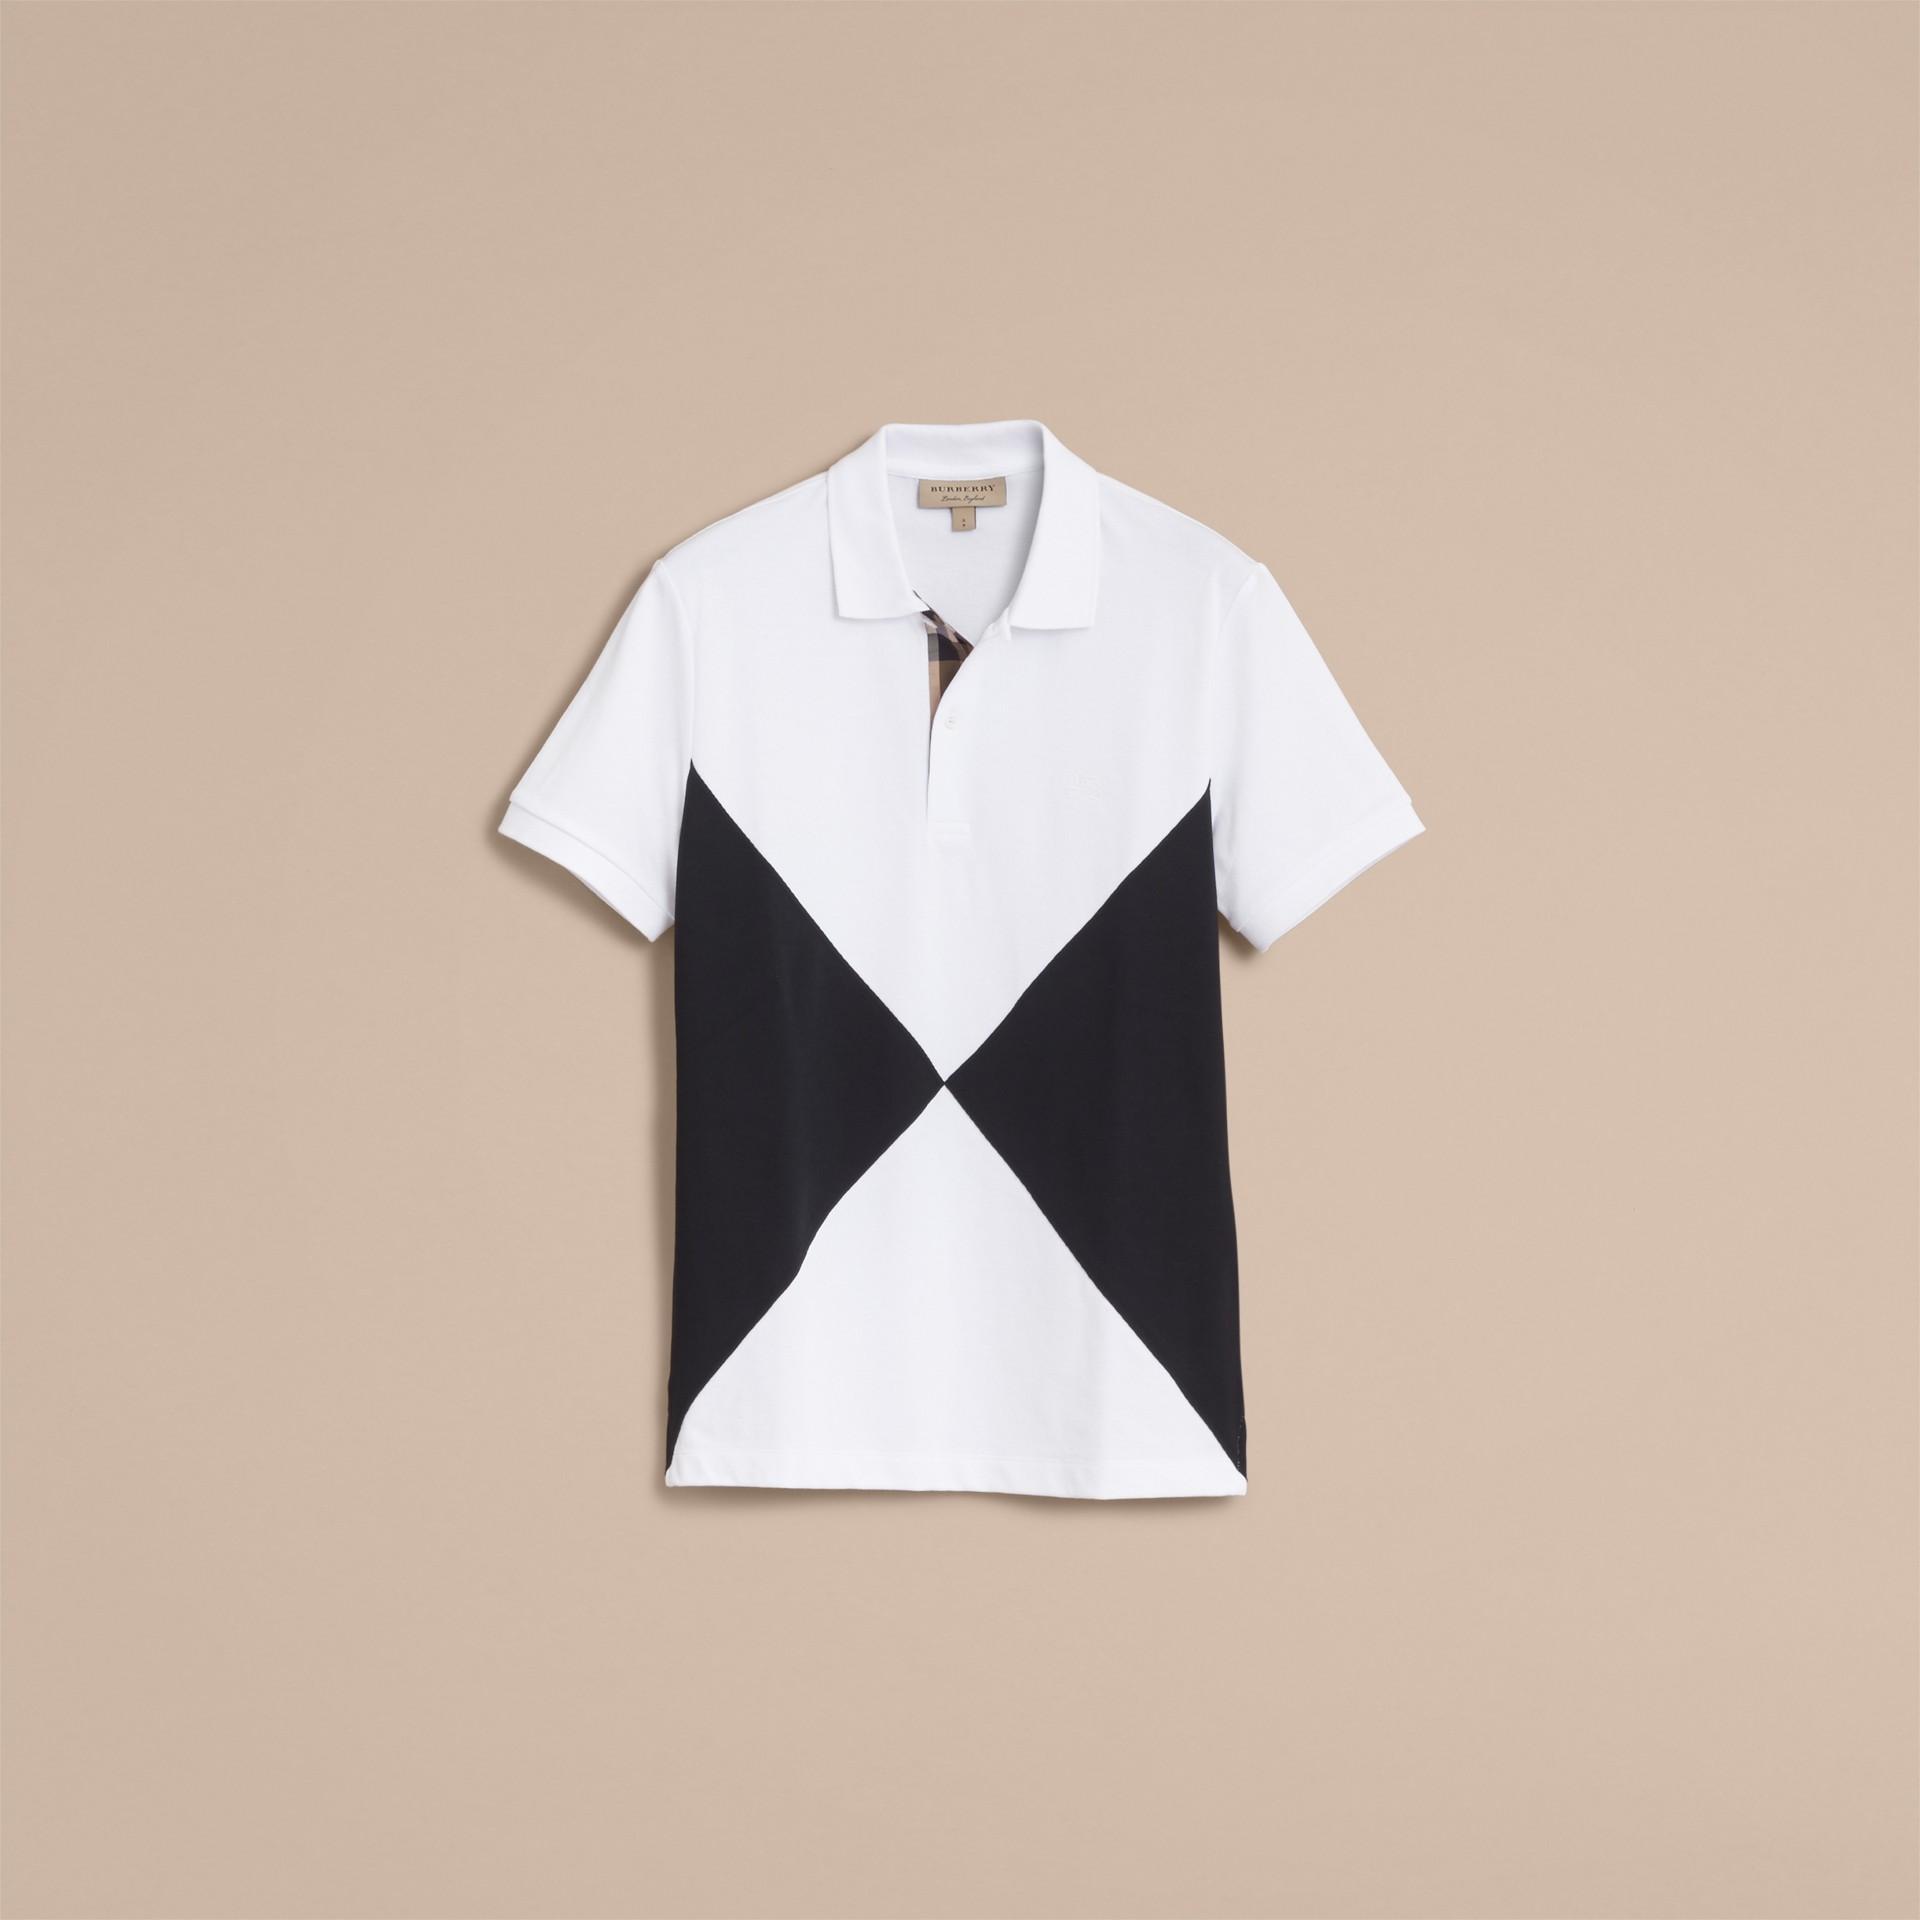 Geometric Motif Cotton Piqué Polo Shirt with Check Placket White - gallery image 4